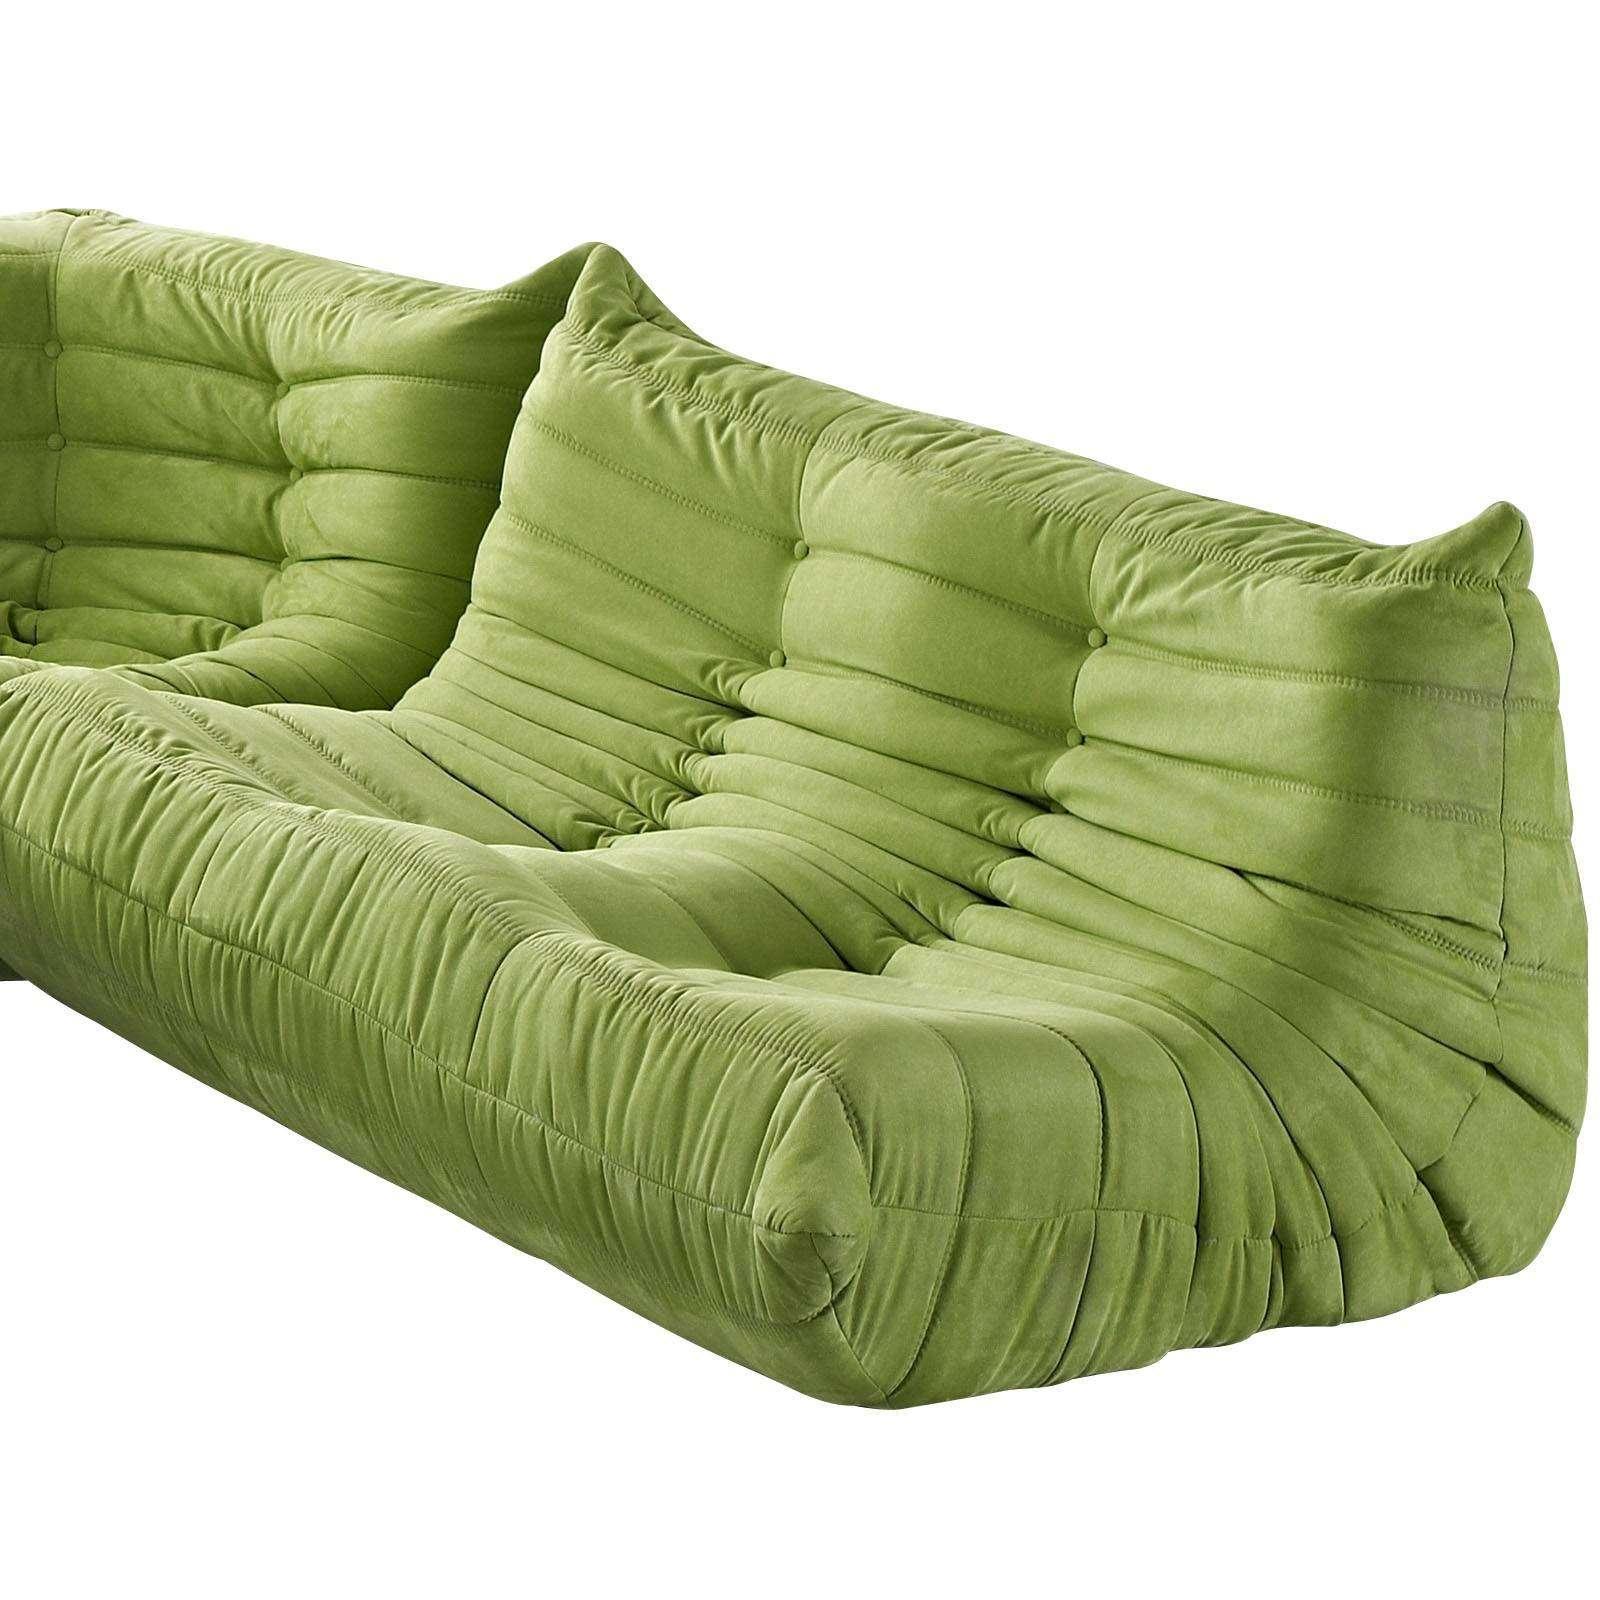 Waverunner Loveseat Sofa Couch